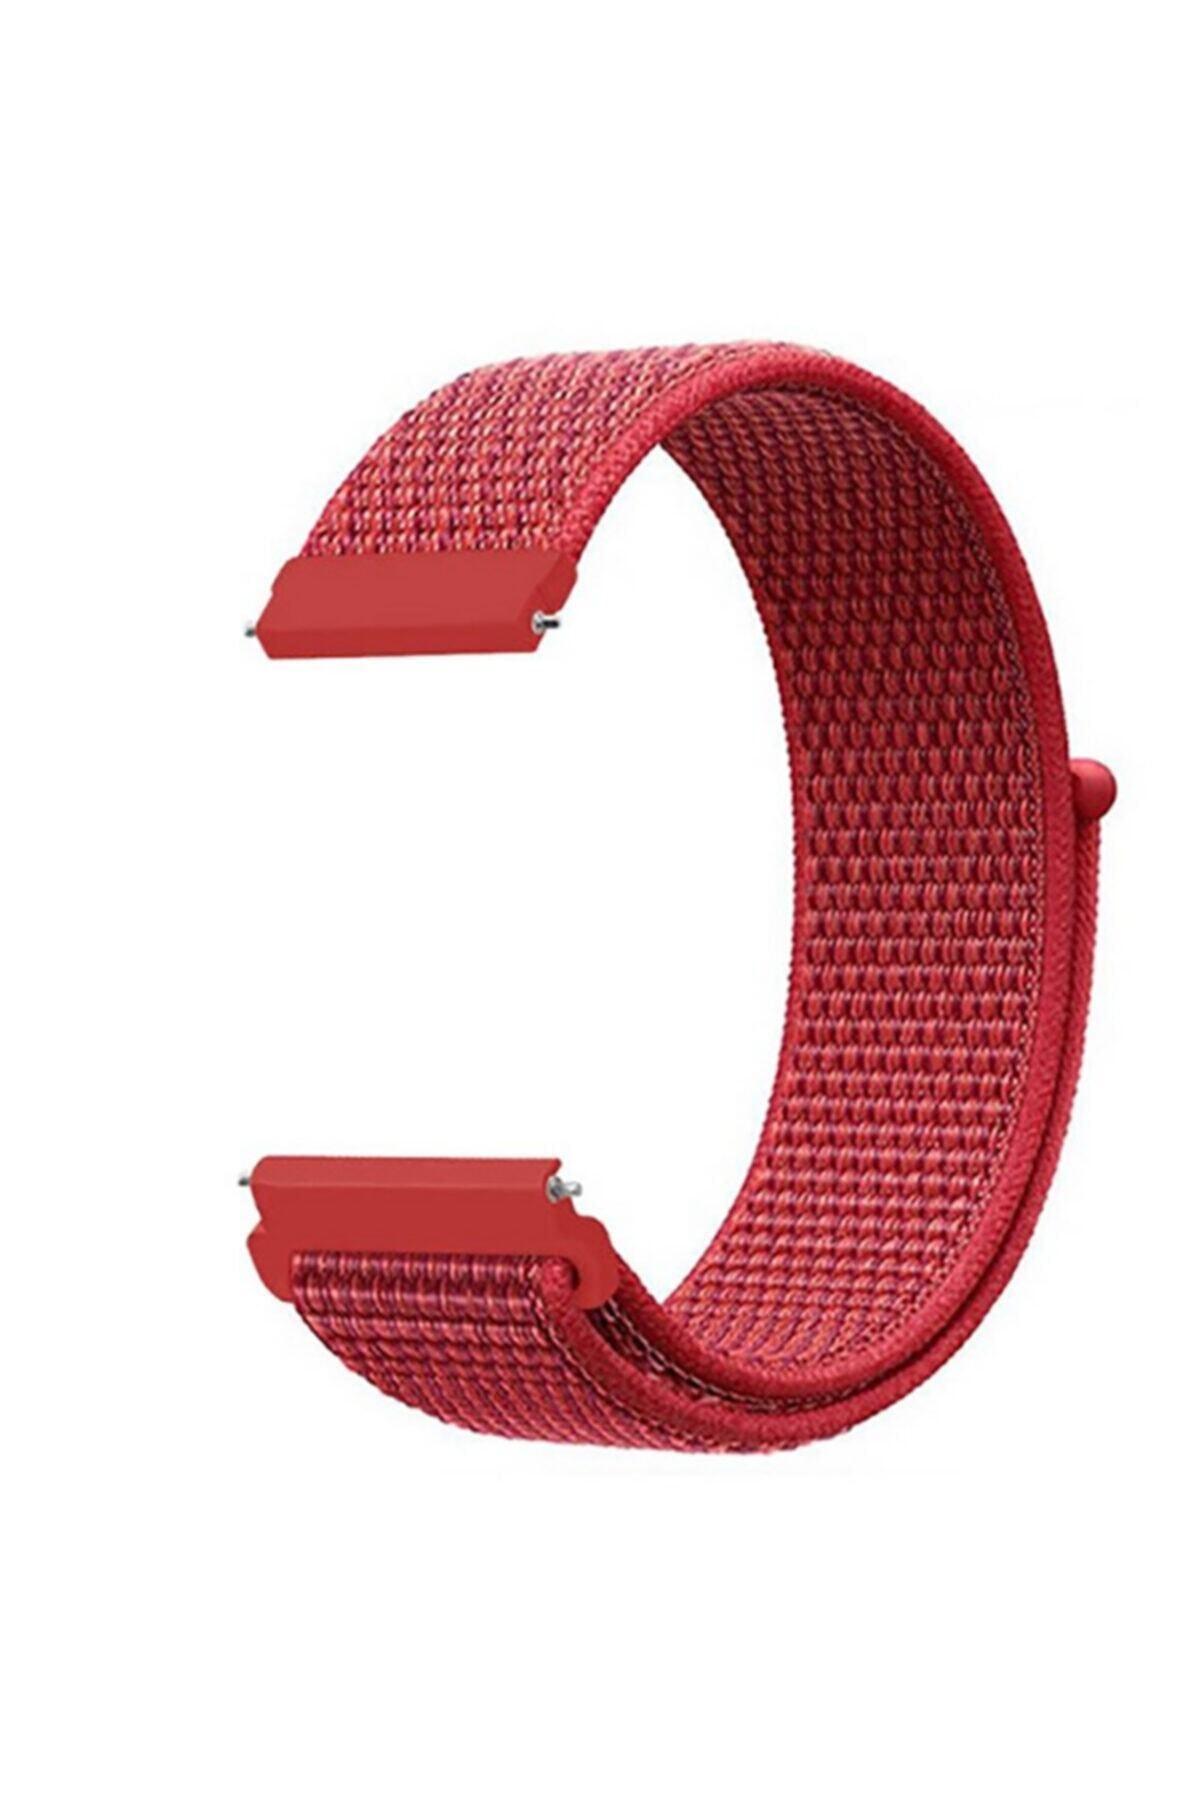 Galaxy Watch 42mm 20mm Krd-03 Akıllı Saat Kordonu Hasır Dokuma Kordon Kayış Bileklik